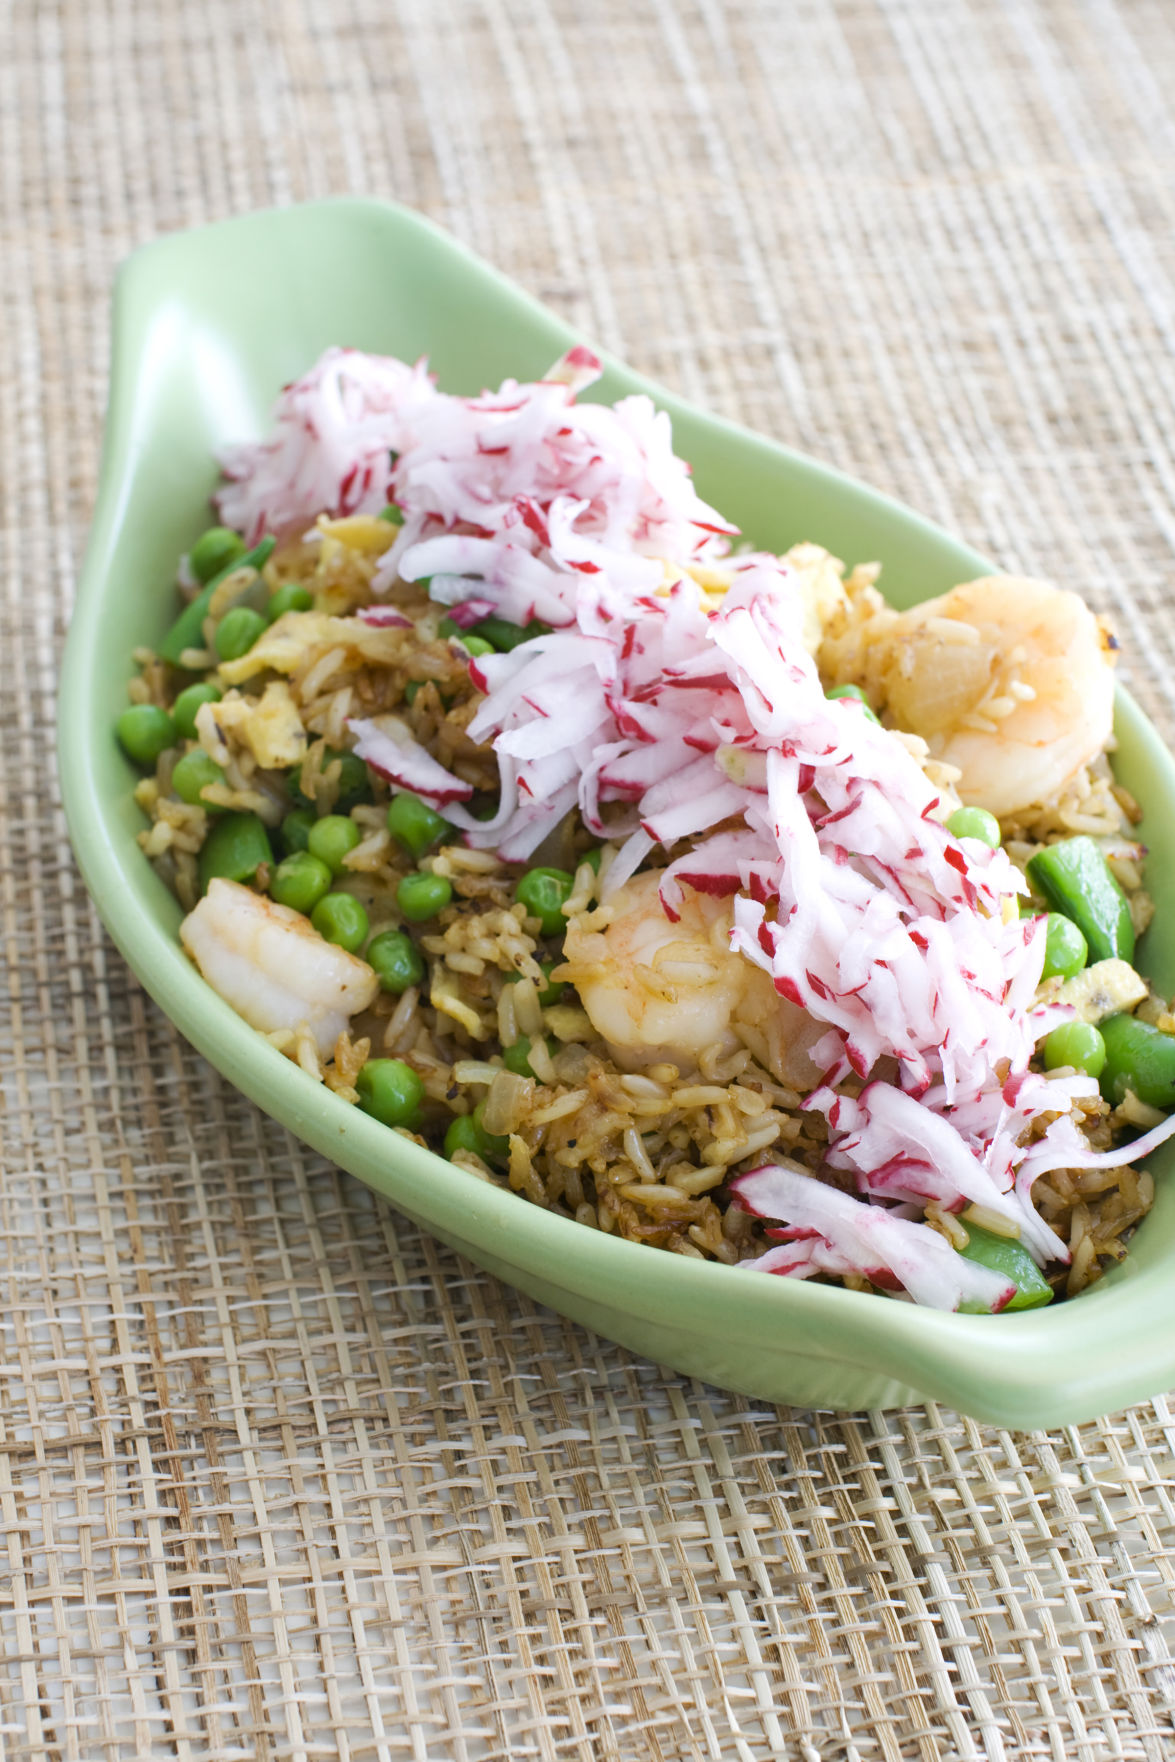 Fried-rice dish versatile, easy